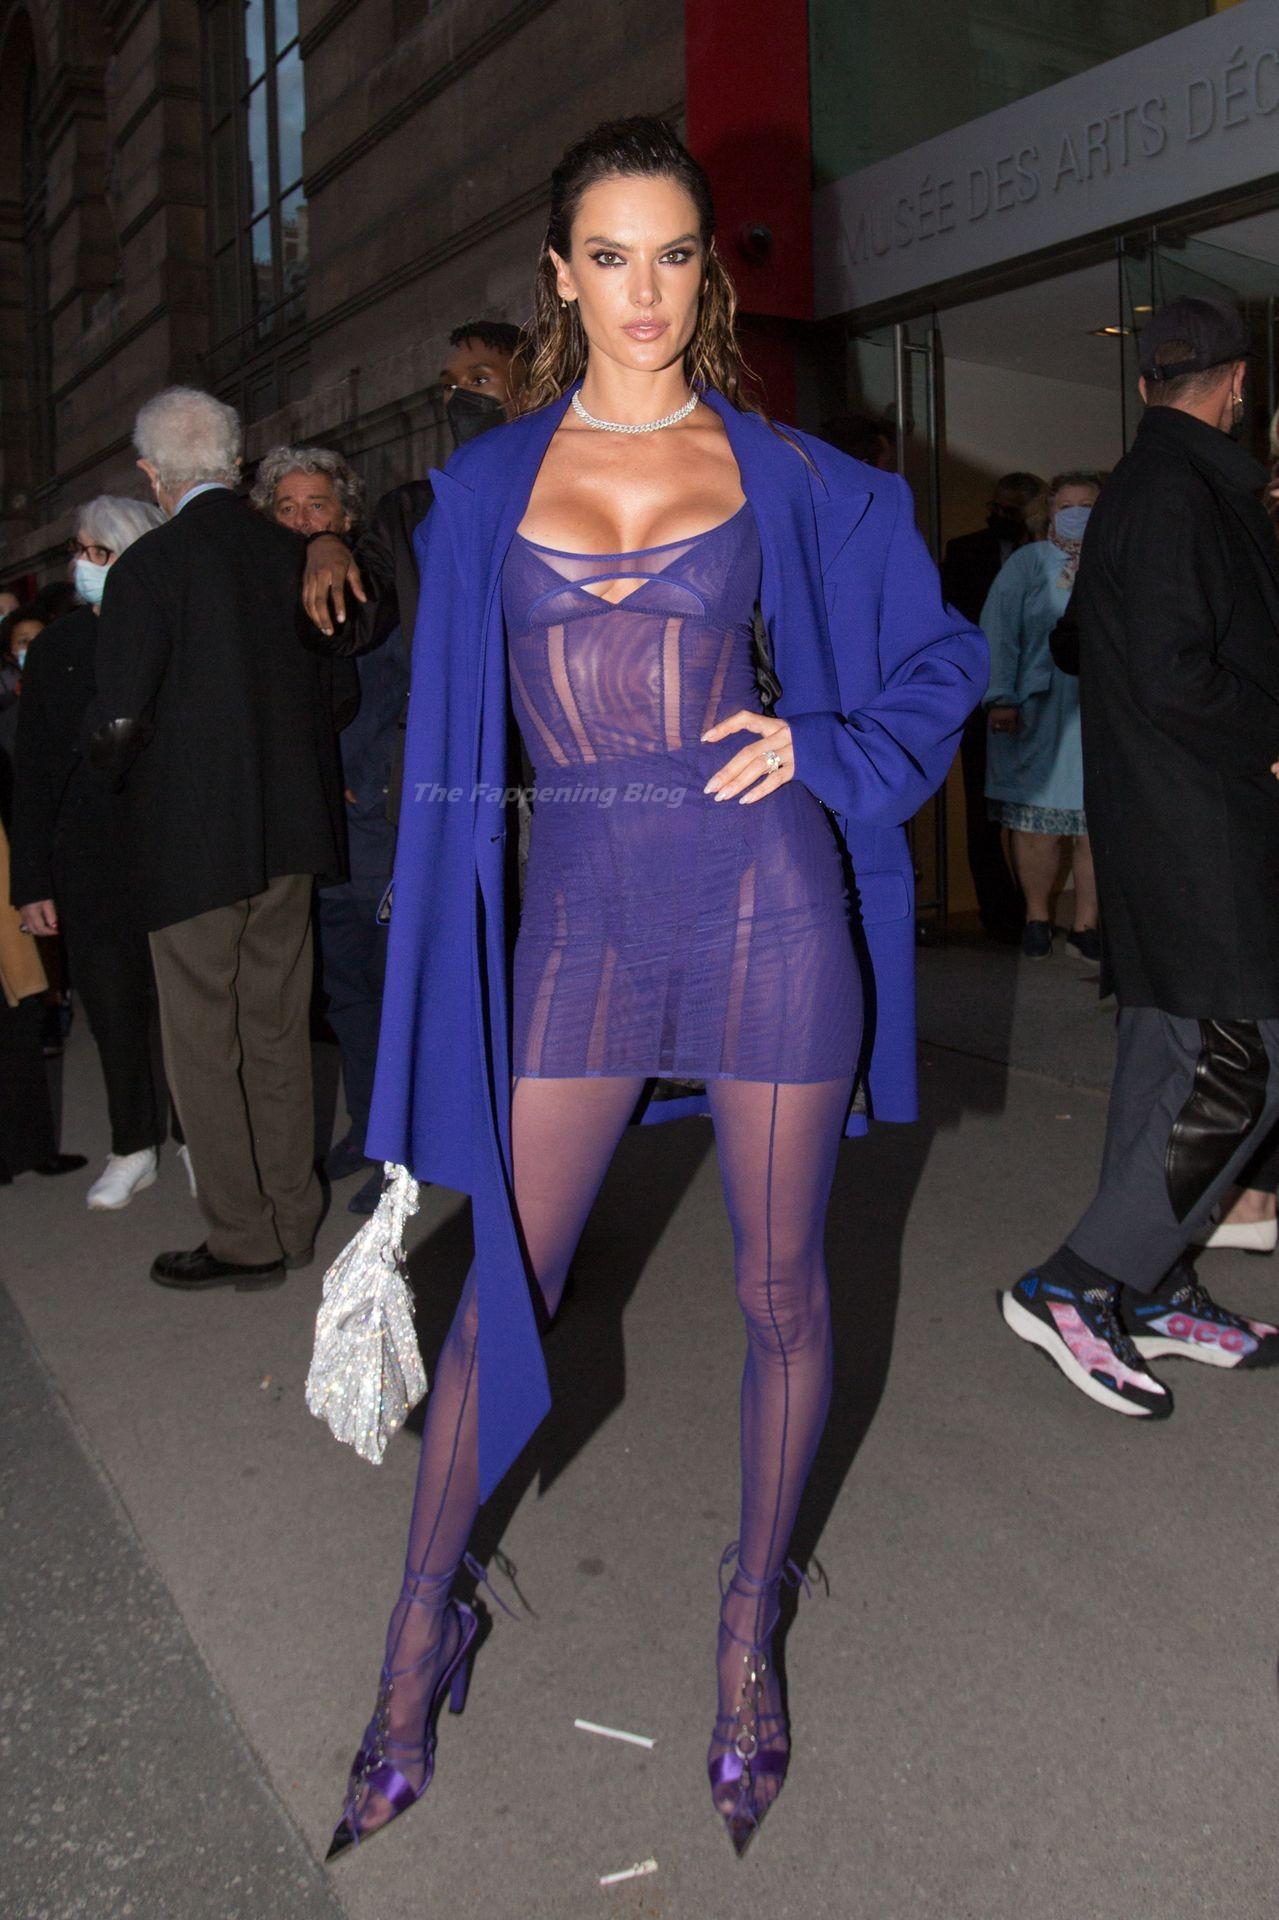 Alessandra-Ambrosio-Sexy-The-Fappening-Blog-10-3.jpg